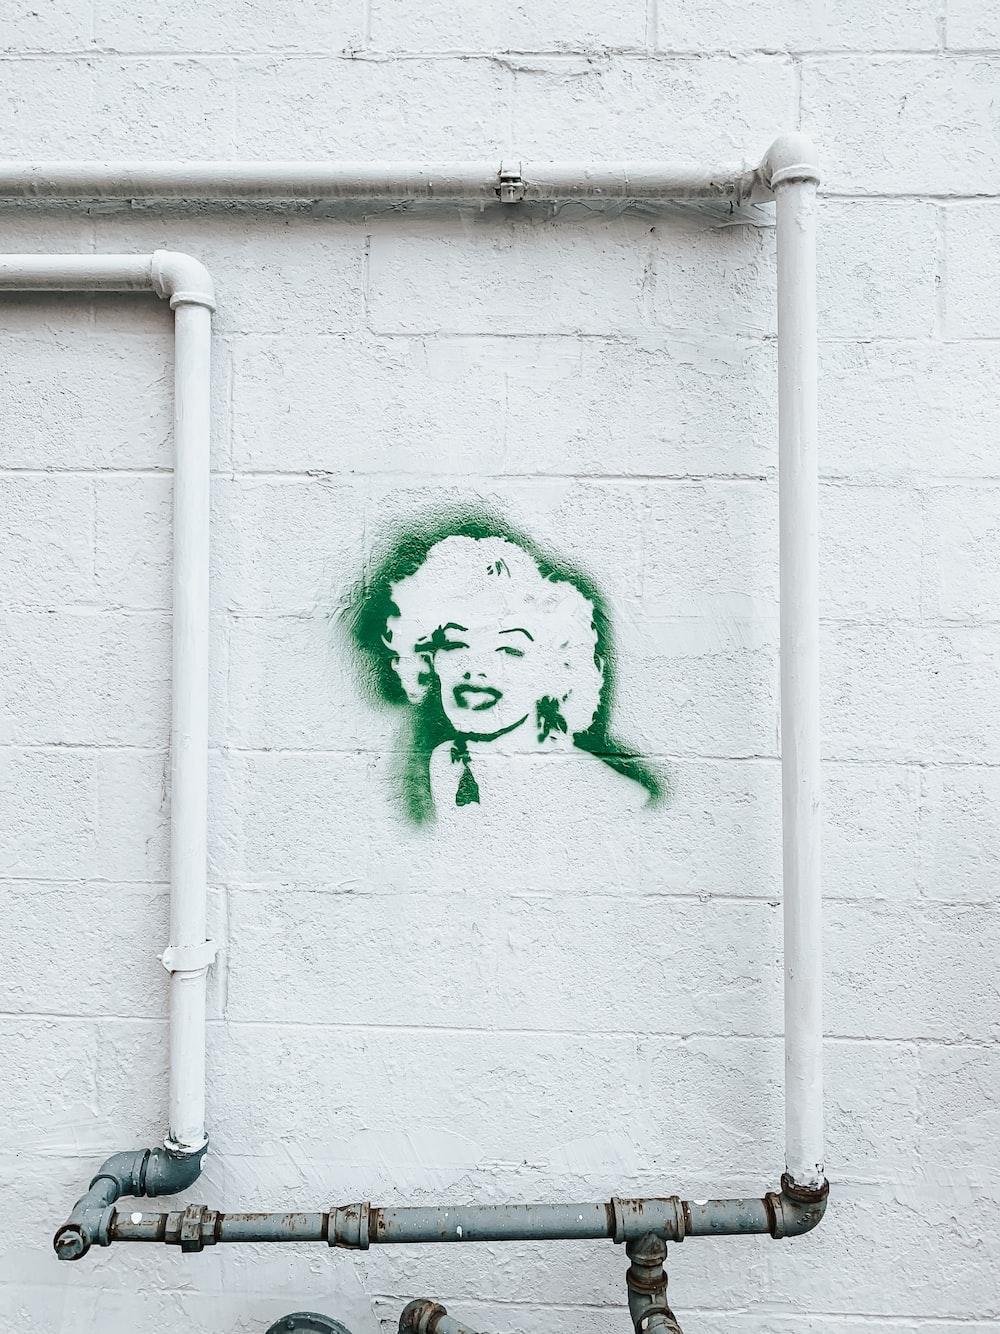 Marilyn Monroe graffiti on white wall